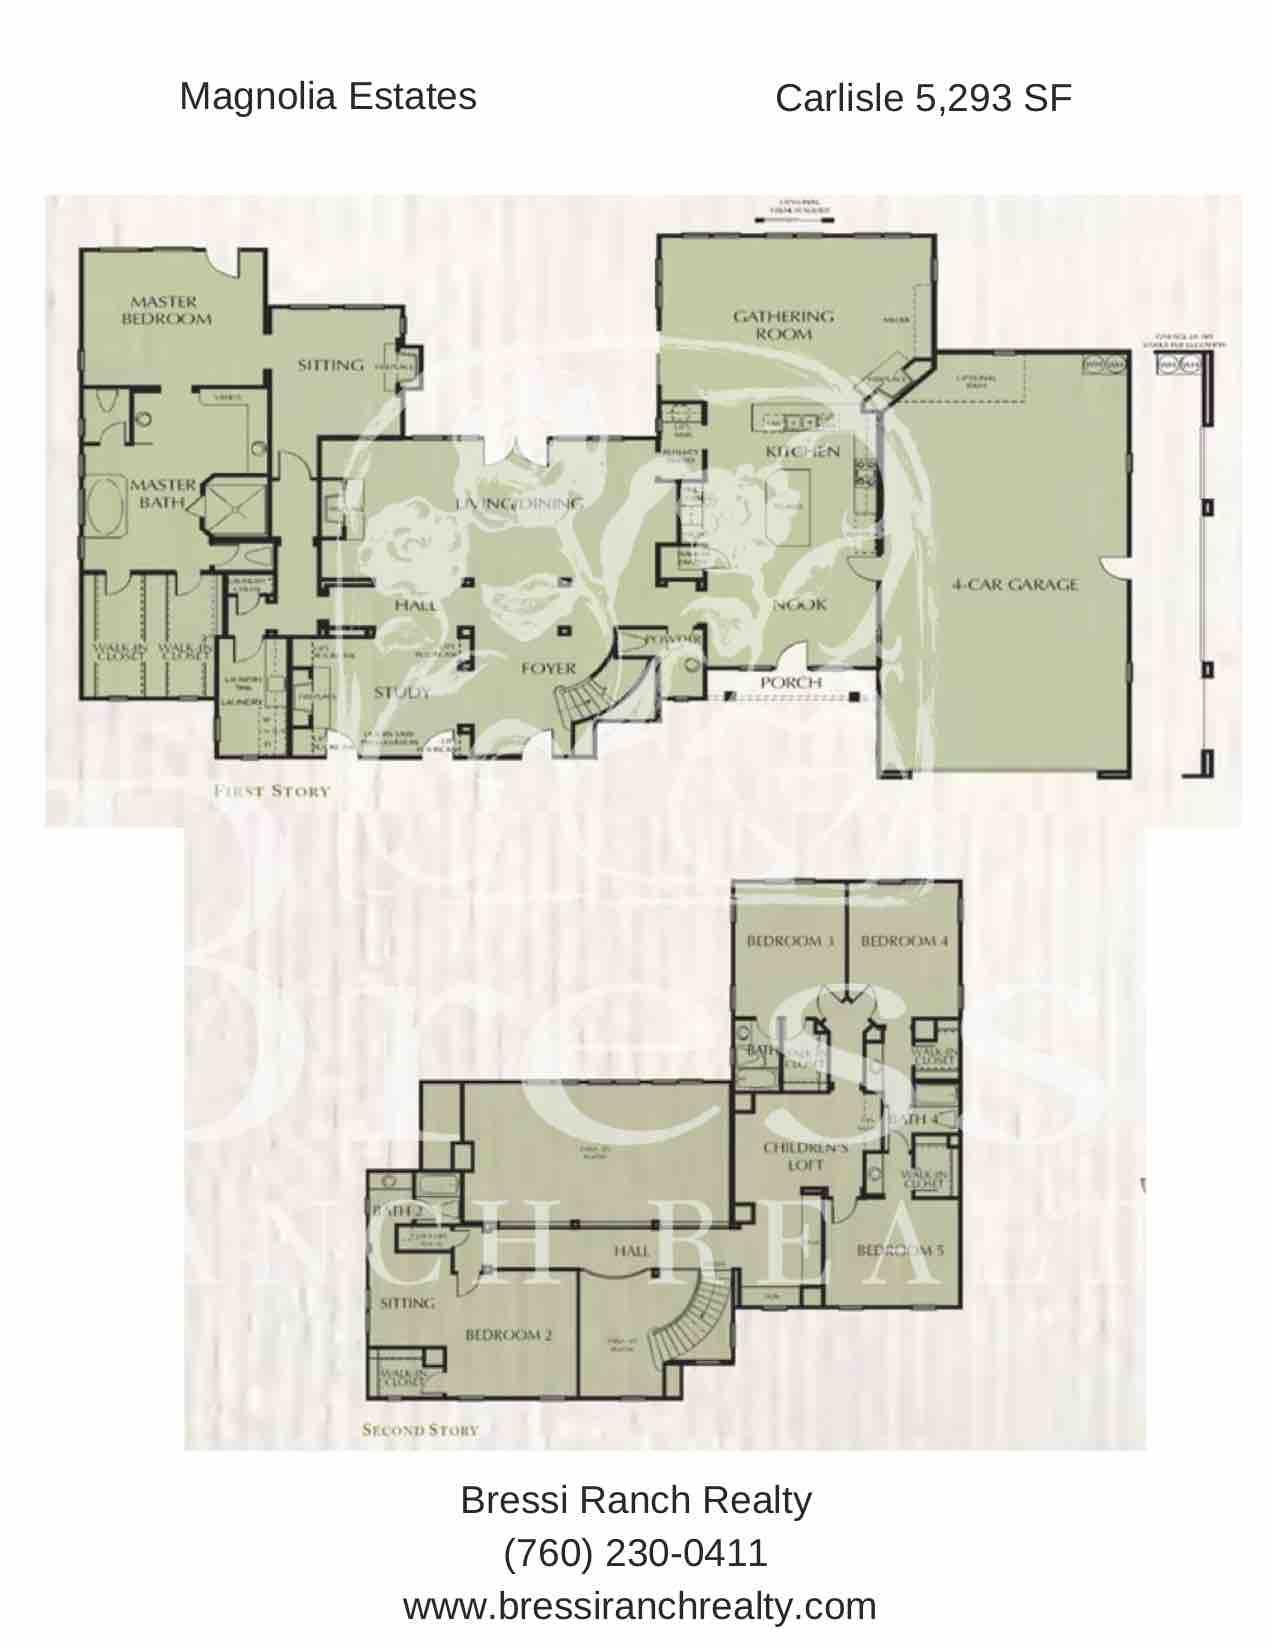 Magnolia Estates Carlisle Floor Plan Bressi Ranch